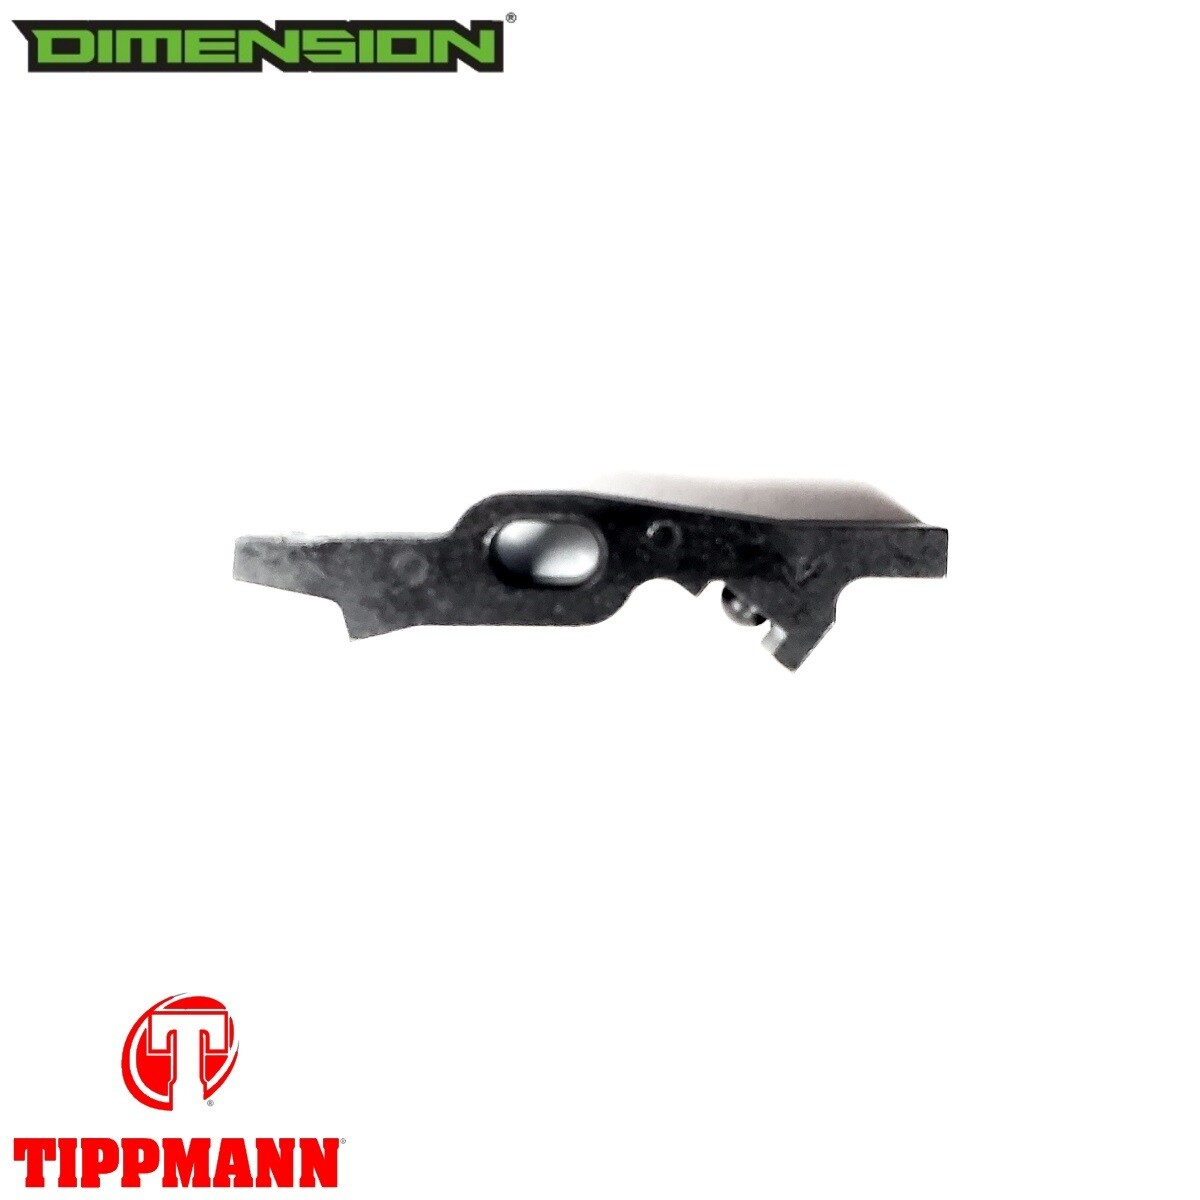 Tippmann 98 Custom, A-5, Cronus, FT-12, FT-50, TMC, Alpha Black, Stormer - Sear